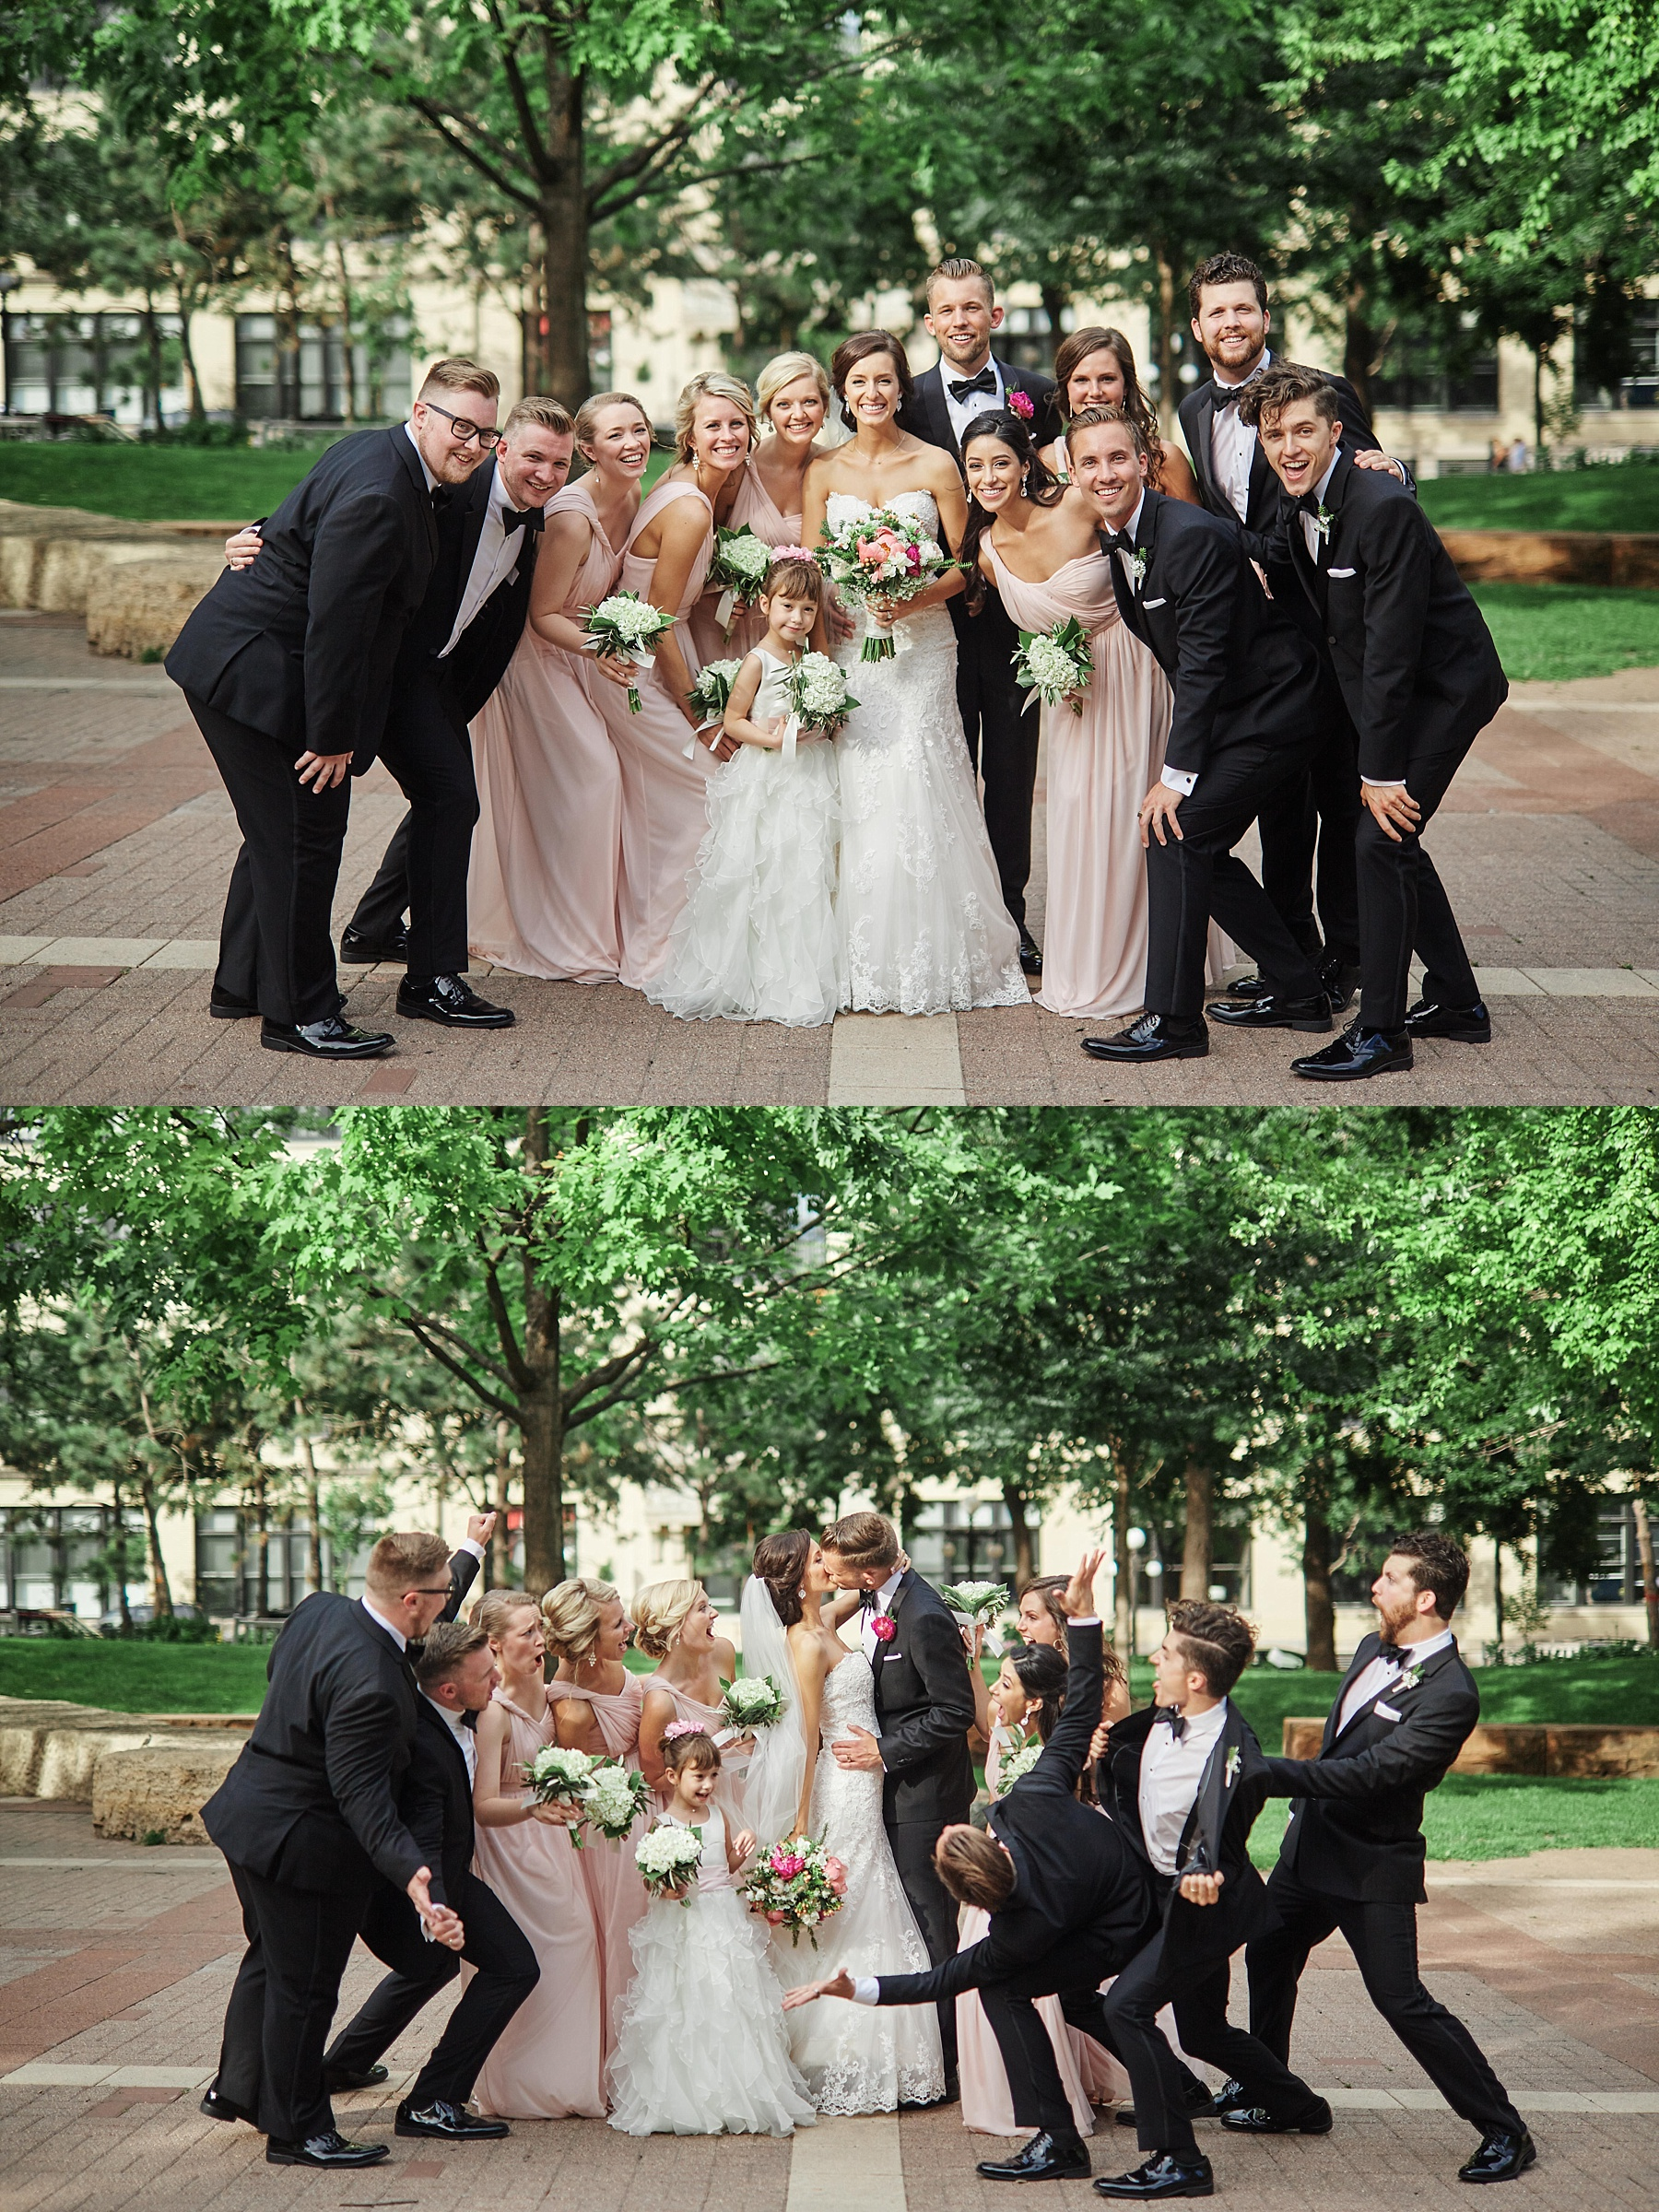 ABULAE-Wedding-Saint-paul-MN-Josh-Sofia-Wedding-Mears-Park_0789.jpg